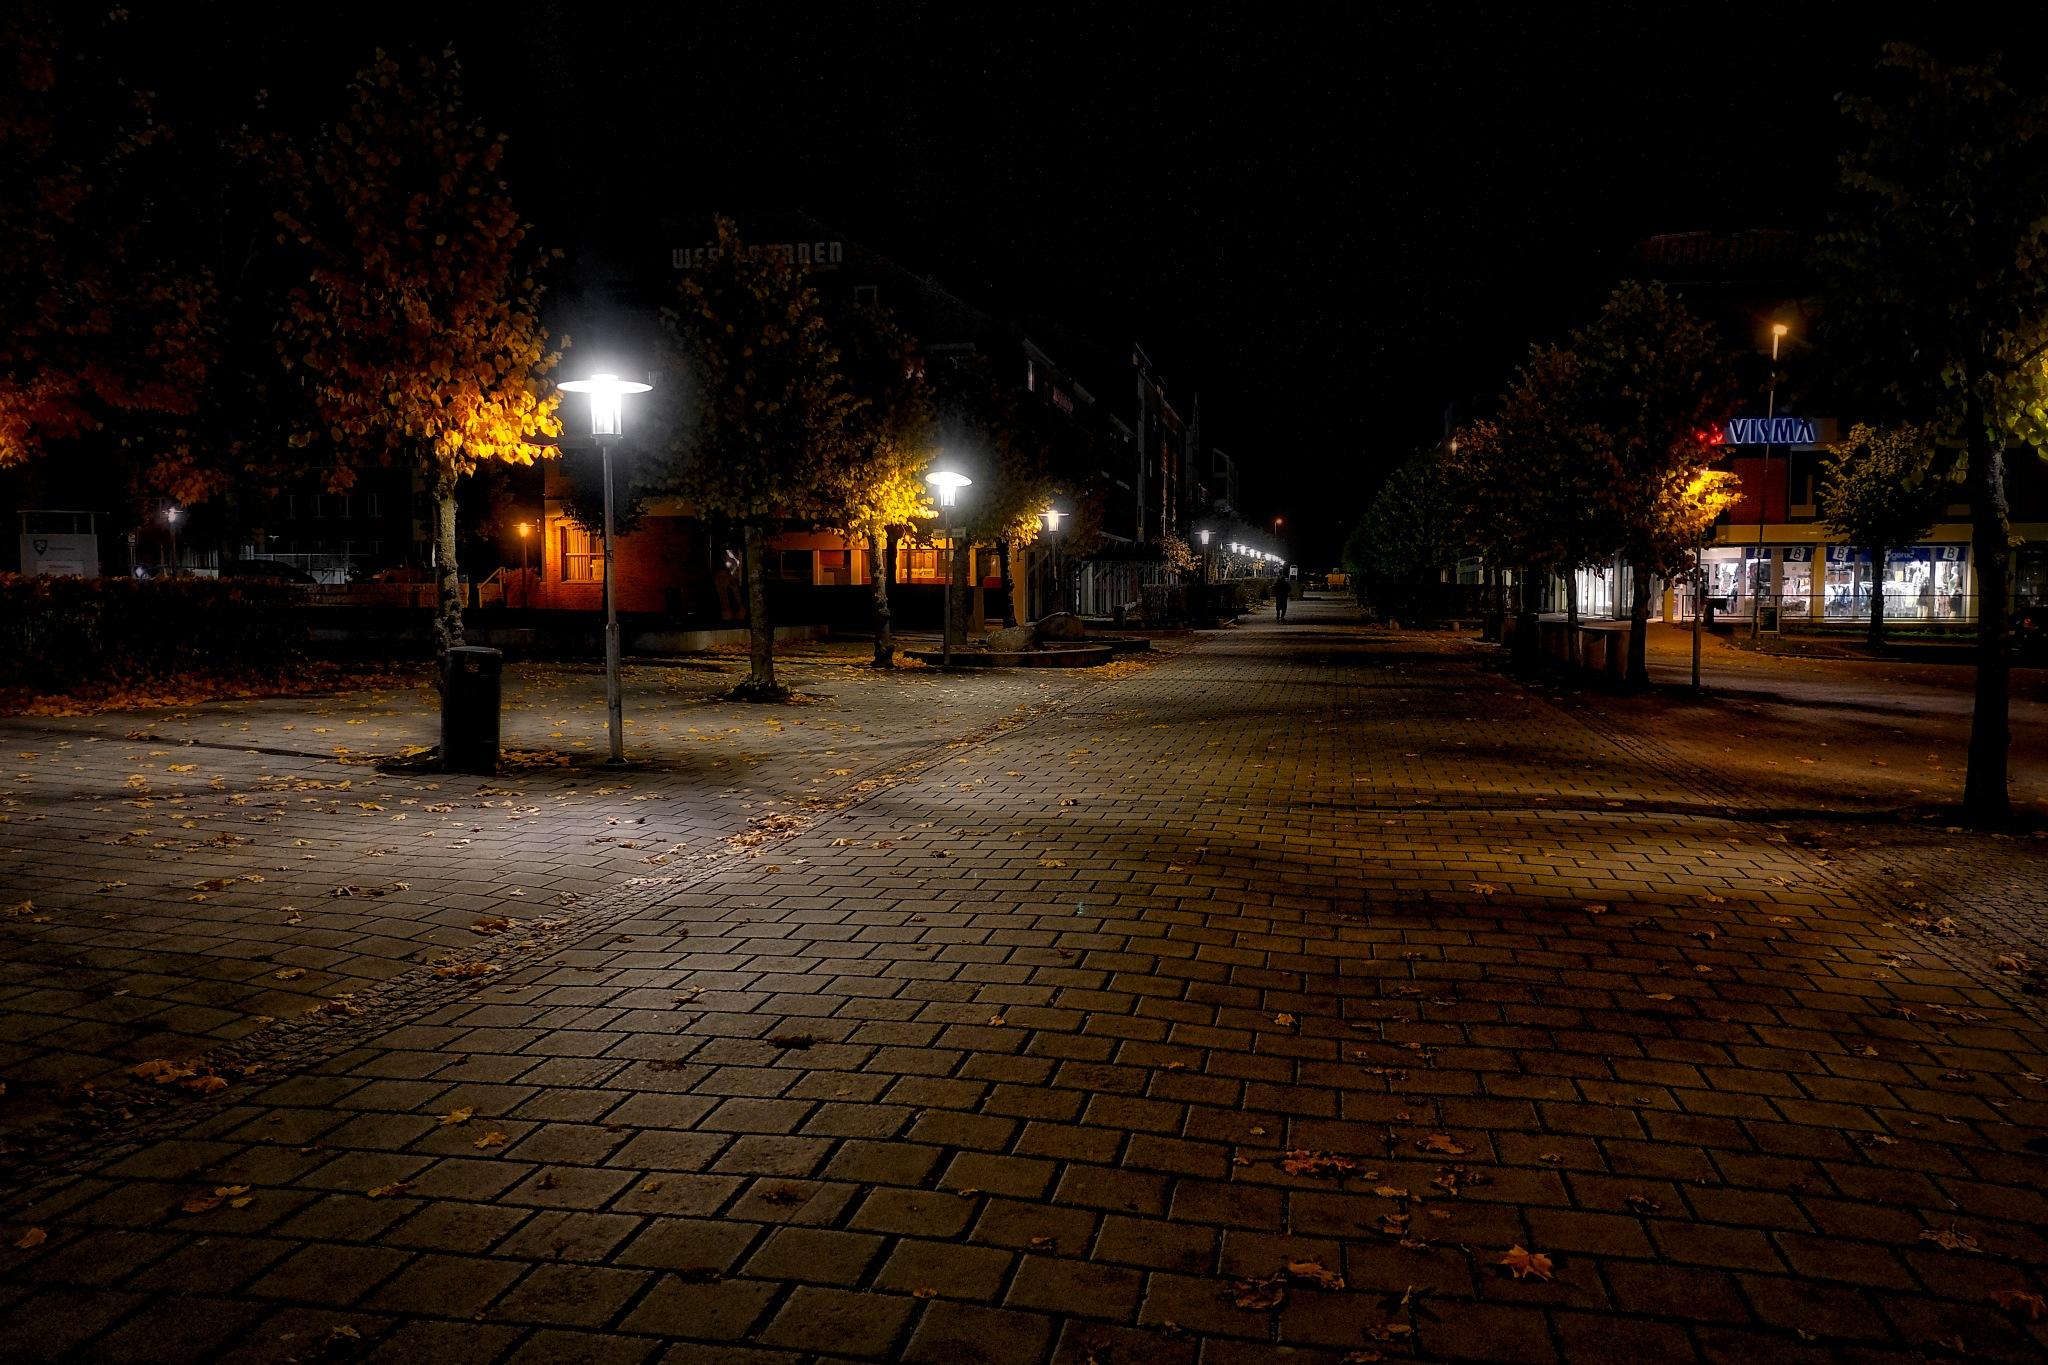 Autumn Night in Norway by Goran Jorganovich